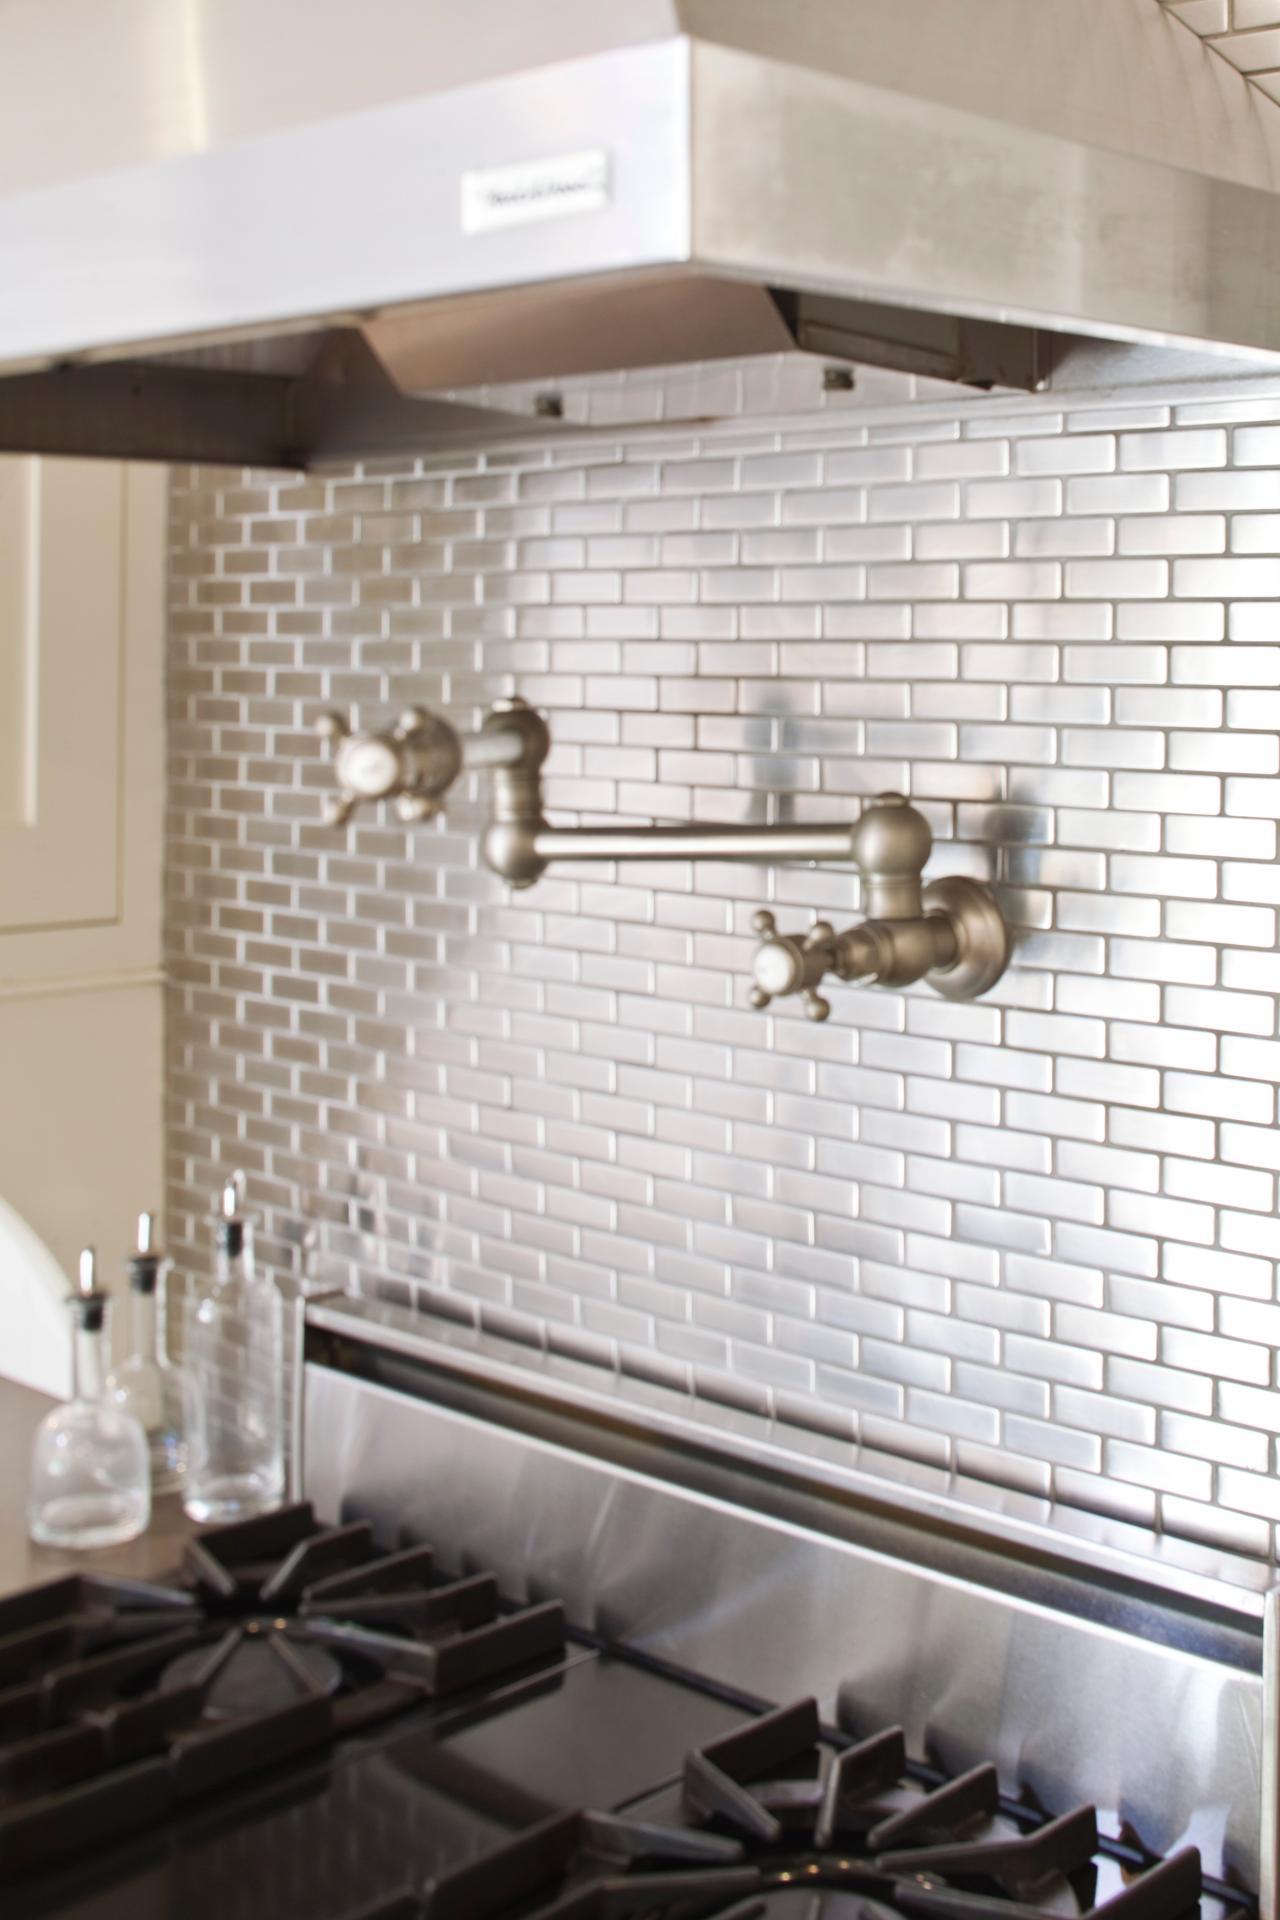 metallic kitchen wall tiles outdoor bbq make a splash with these backsplash designs bkc